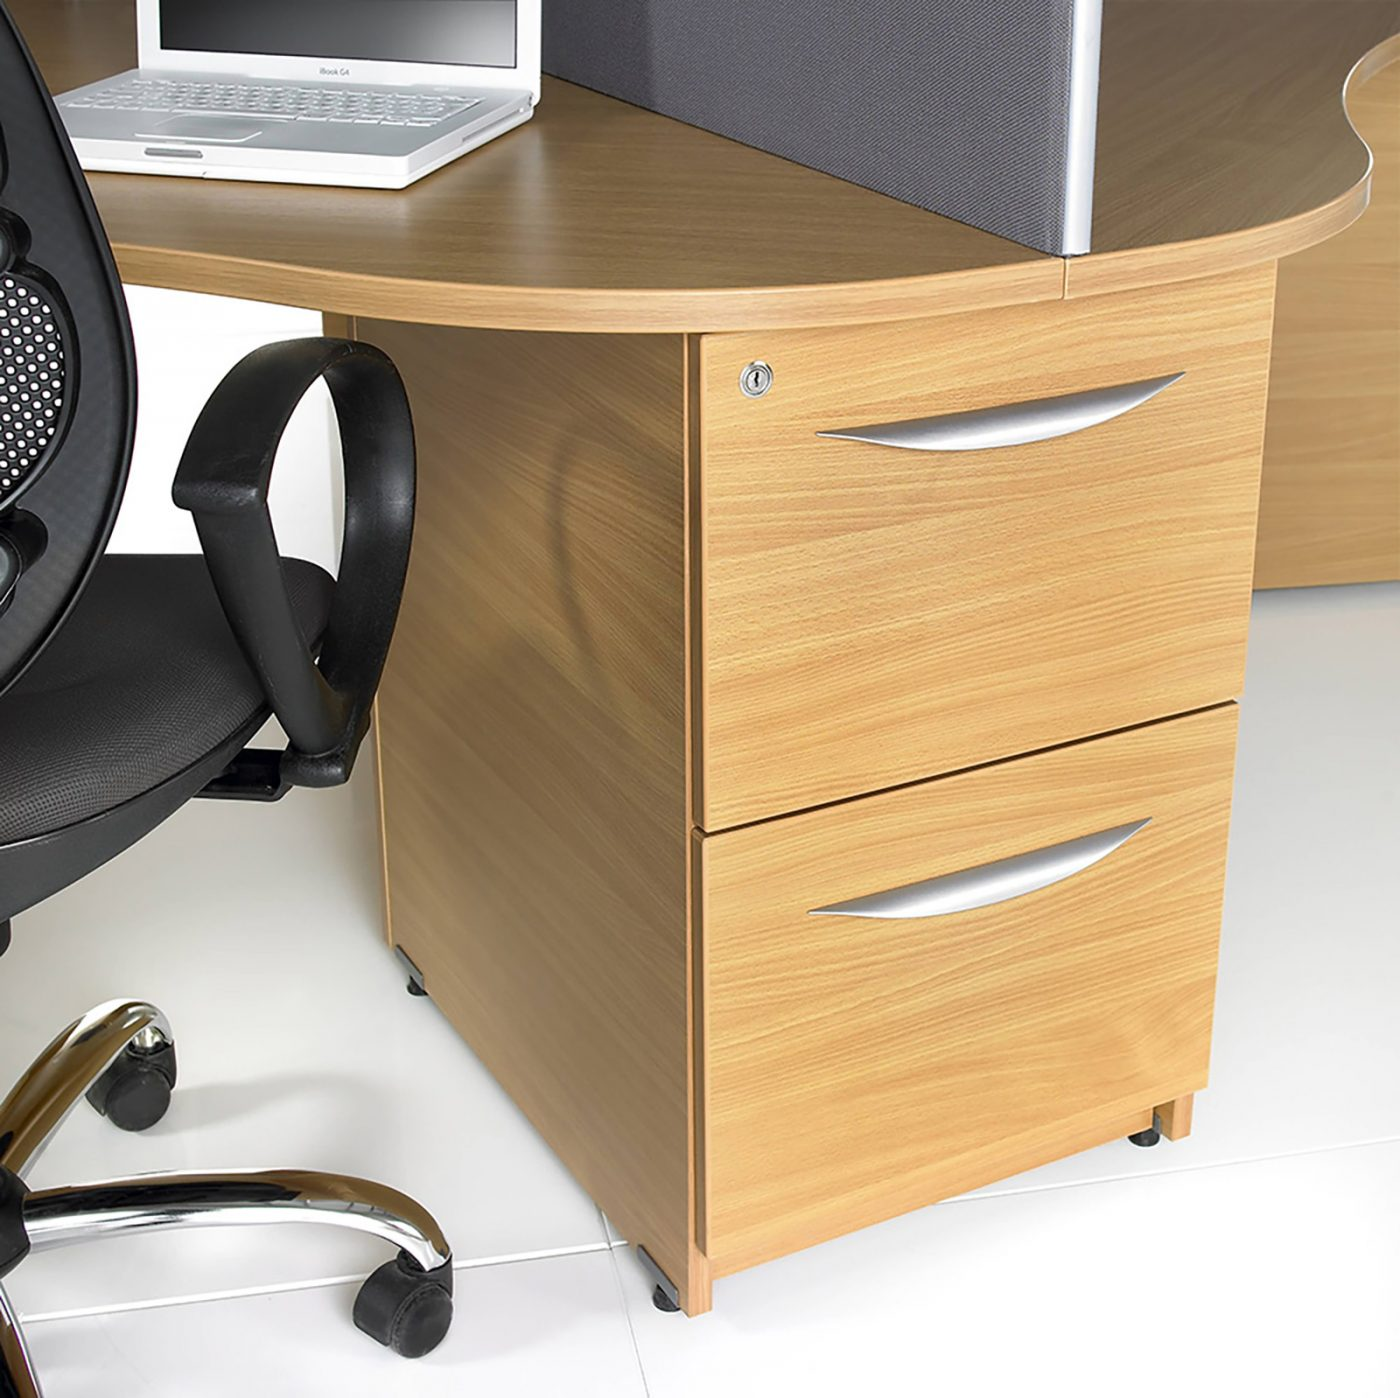 under desk ped, storage, call centre unit